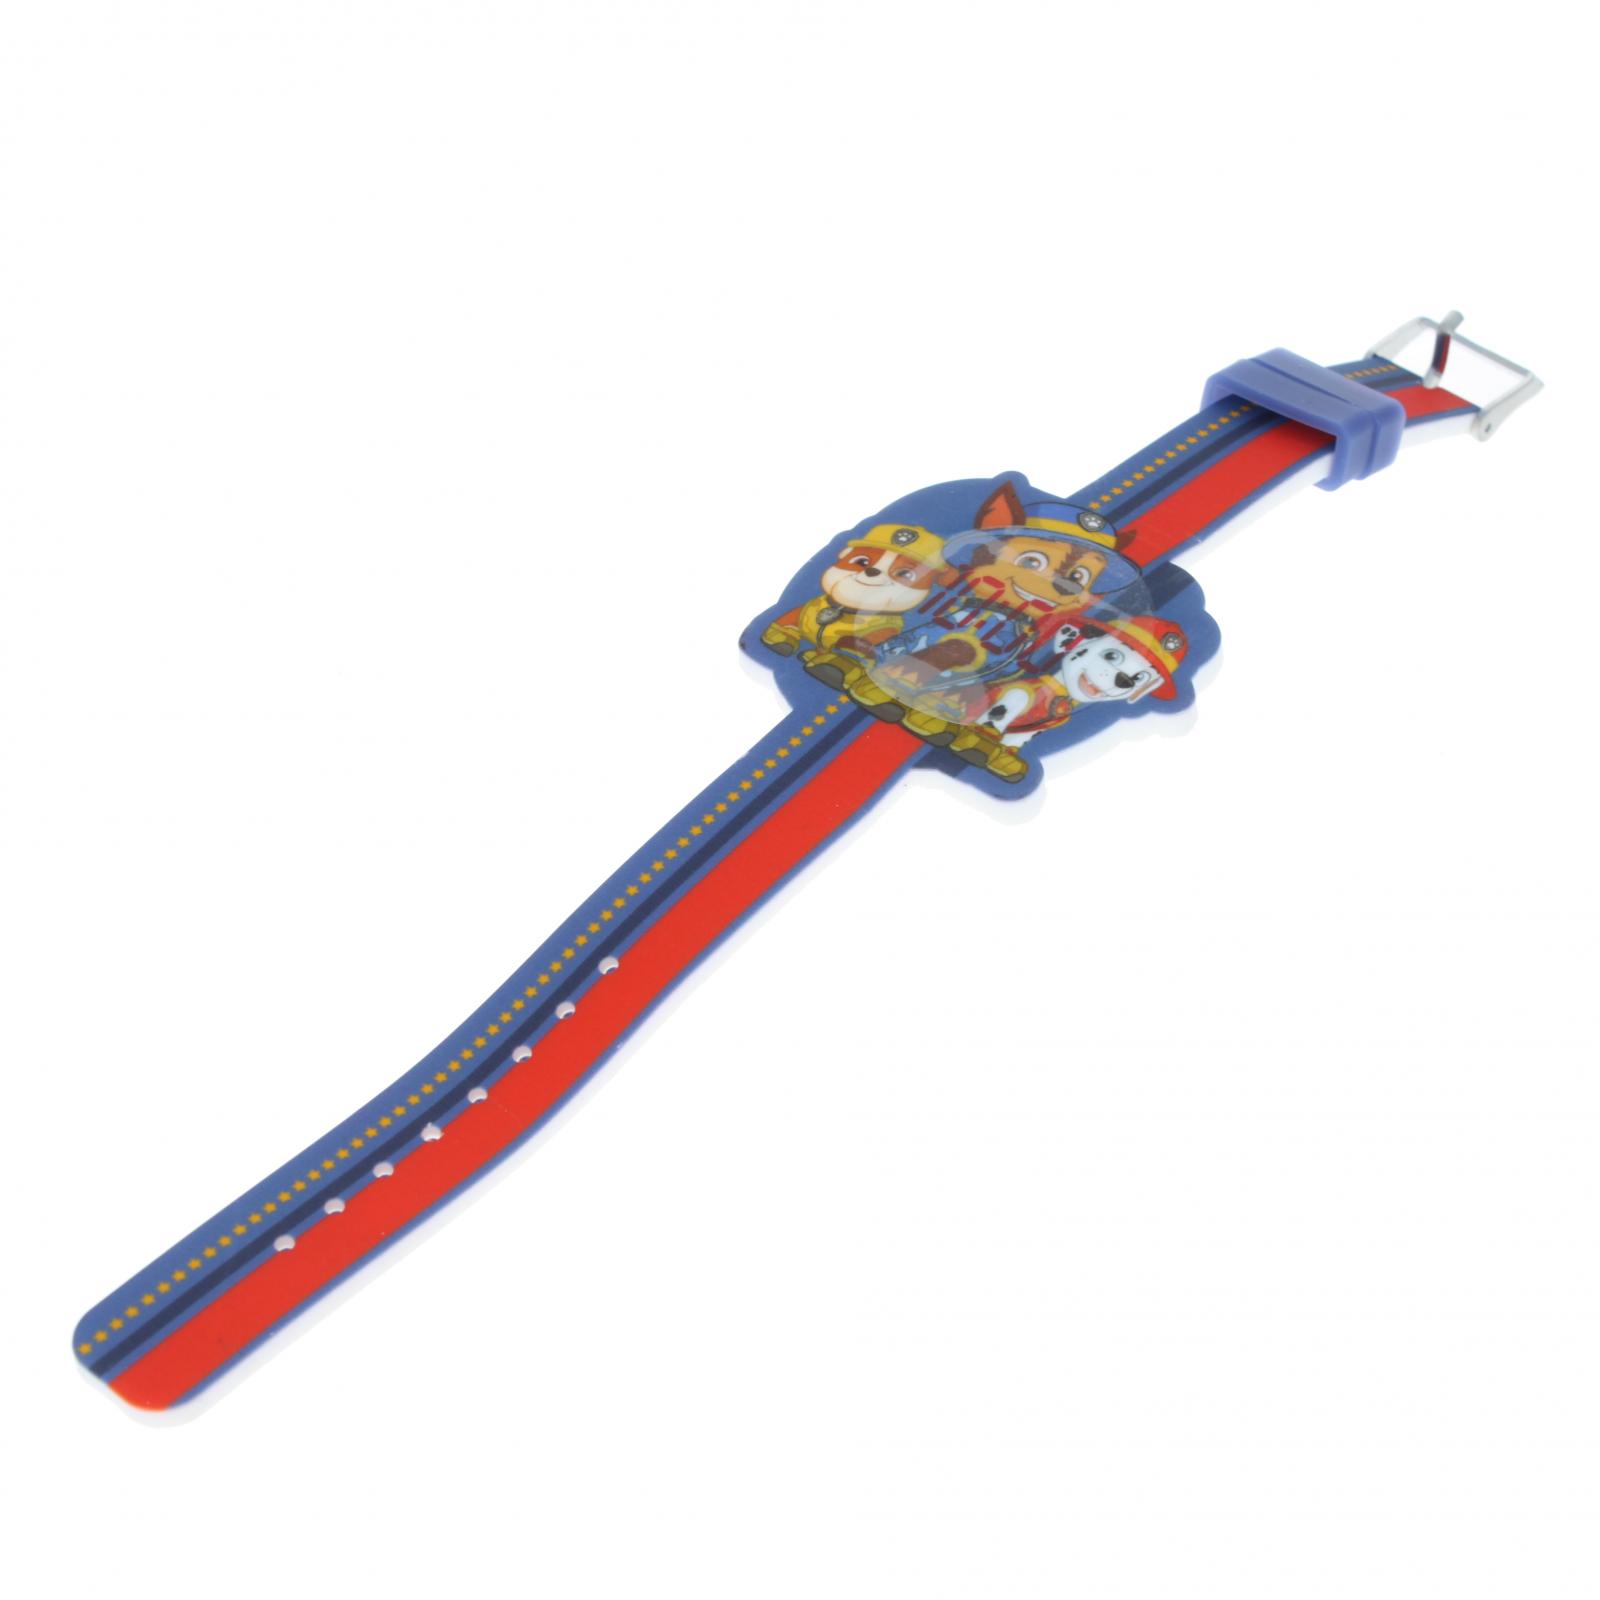 Nickelodeon Paw Patrol Digital Touch LED Wrist Watch Kids